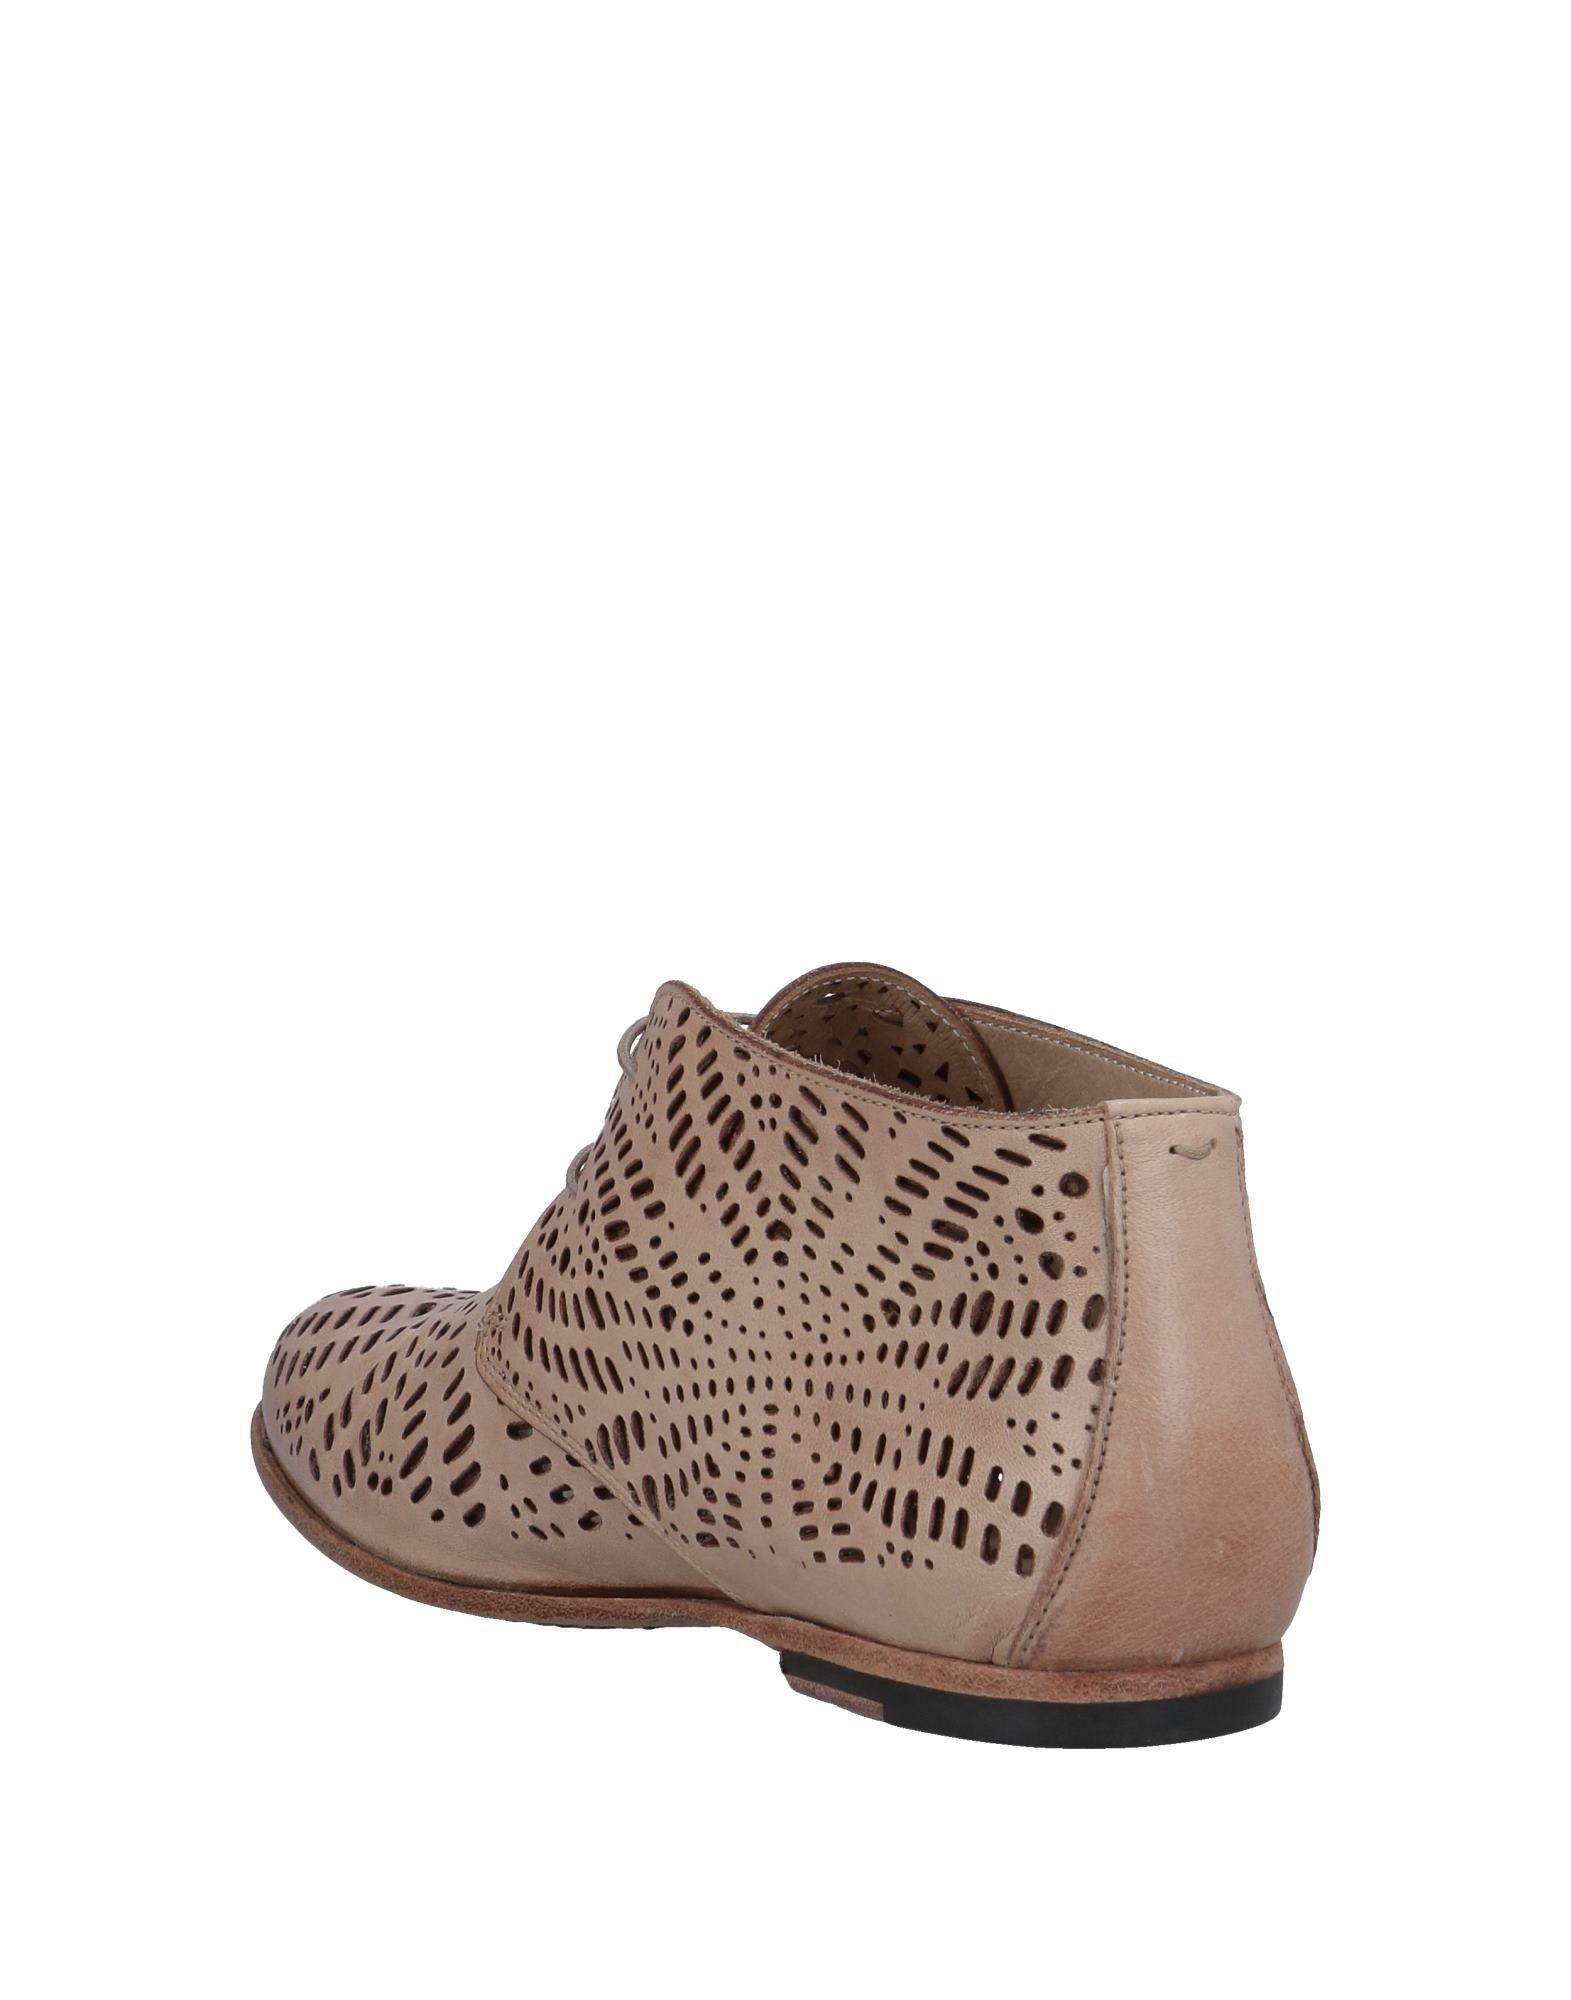 Stilvolle billige Schuhe I.N.K. 11548554LB Schuhes Stiefelette Damen  11548554LB I.N.K. 8176f6